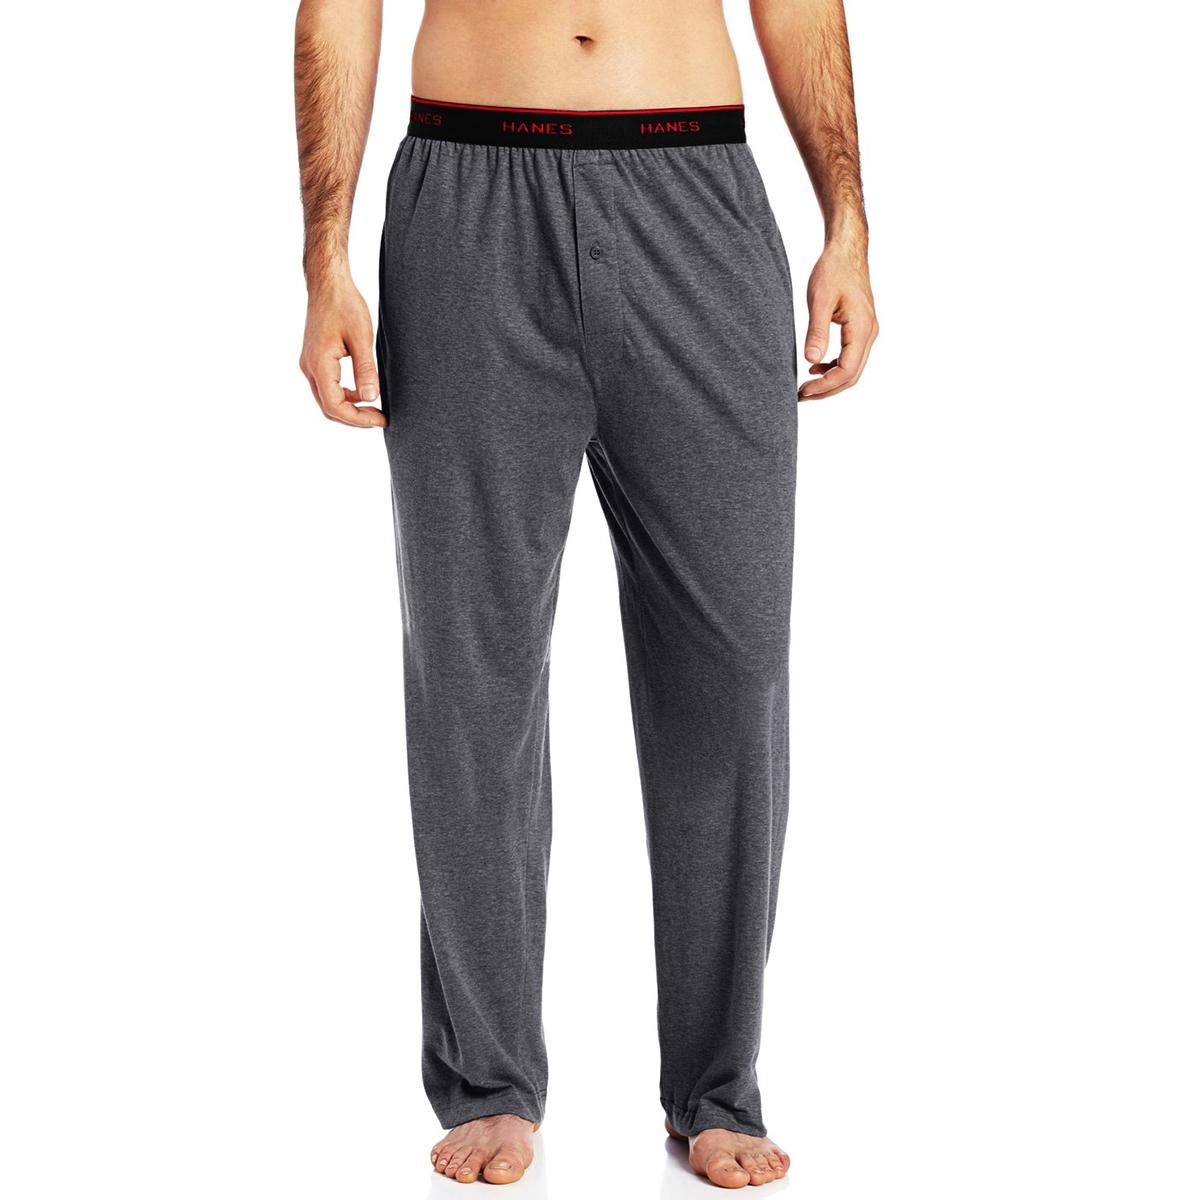 Hanes Men's Tagless Sleep Lounge Pants Solid Soft Knit